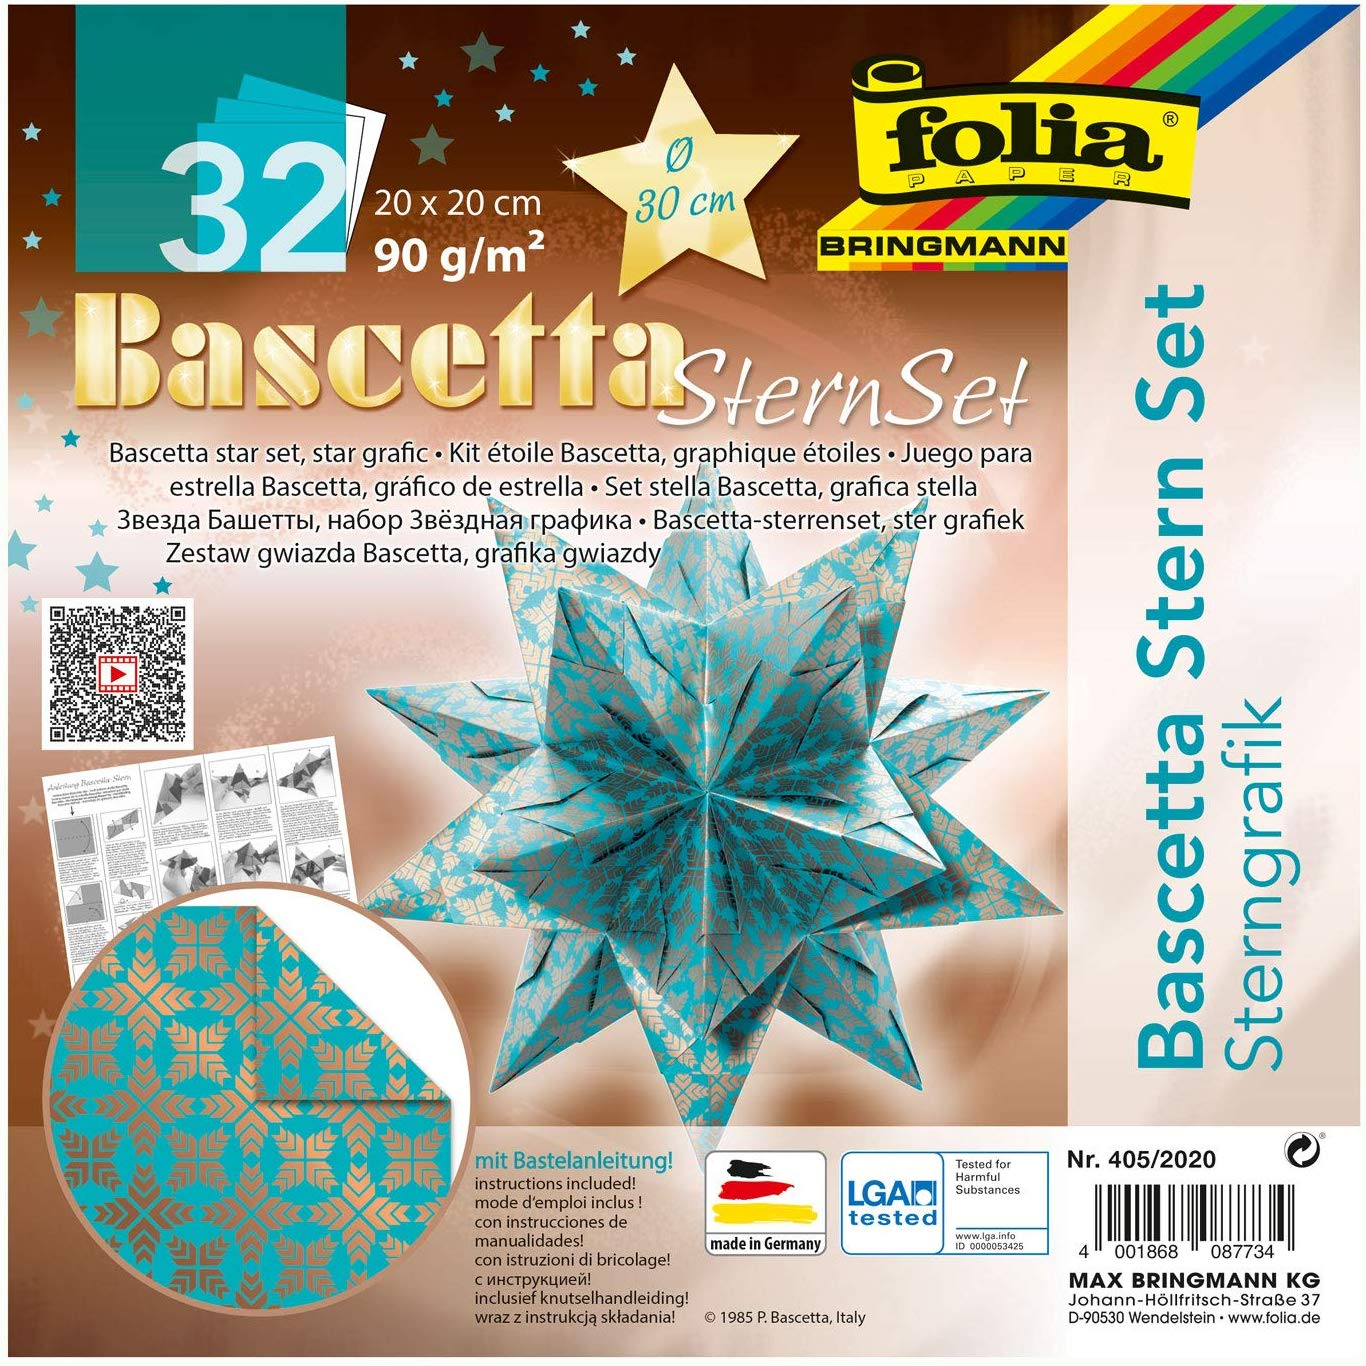 folia 405/2020 - Bastelset Bascetta Stern Sterngrafik türkis/kupfer, 32 Blatt, 20 x 20 cm, fertige G